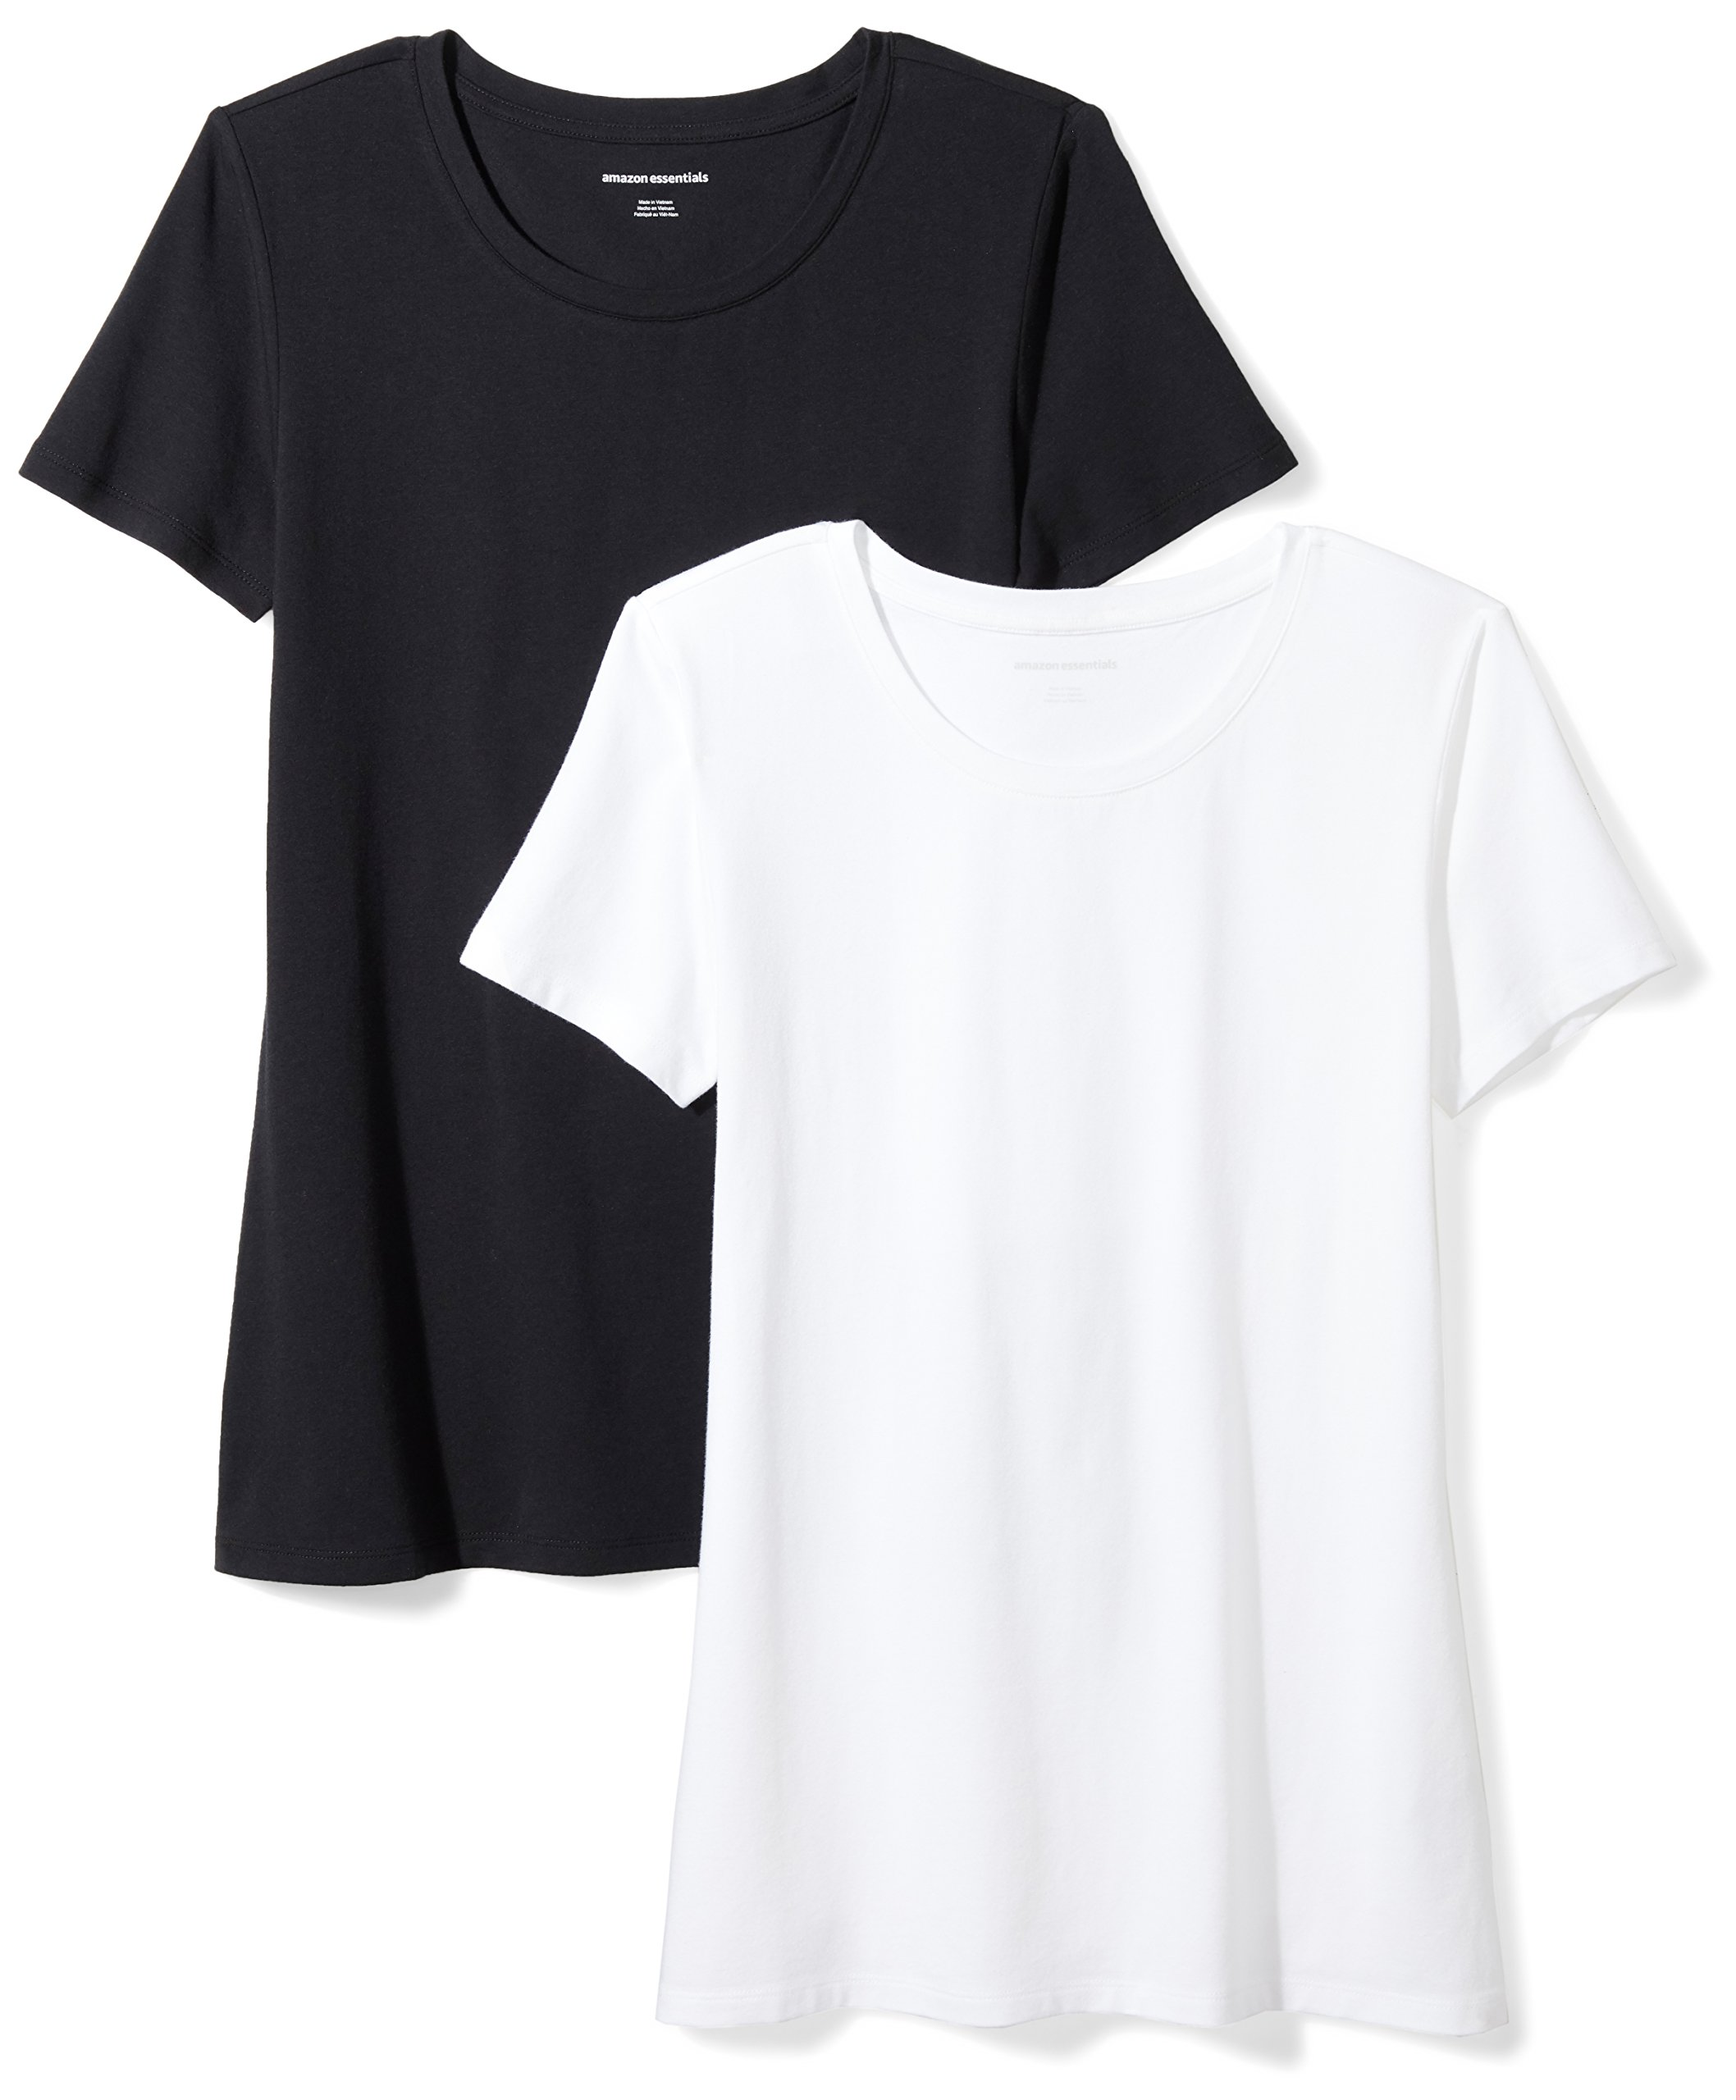 Amazon Essentials Women's 2-Pack Classic-Fit Short-Sleeve Crewneck T-Shirt, Black/White, Medium by Amazon Essentials